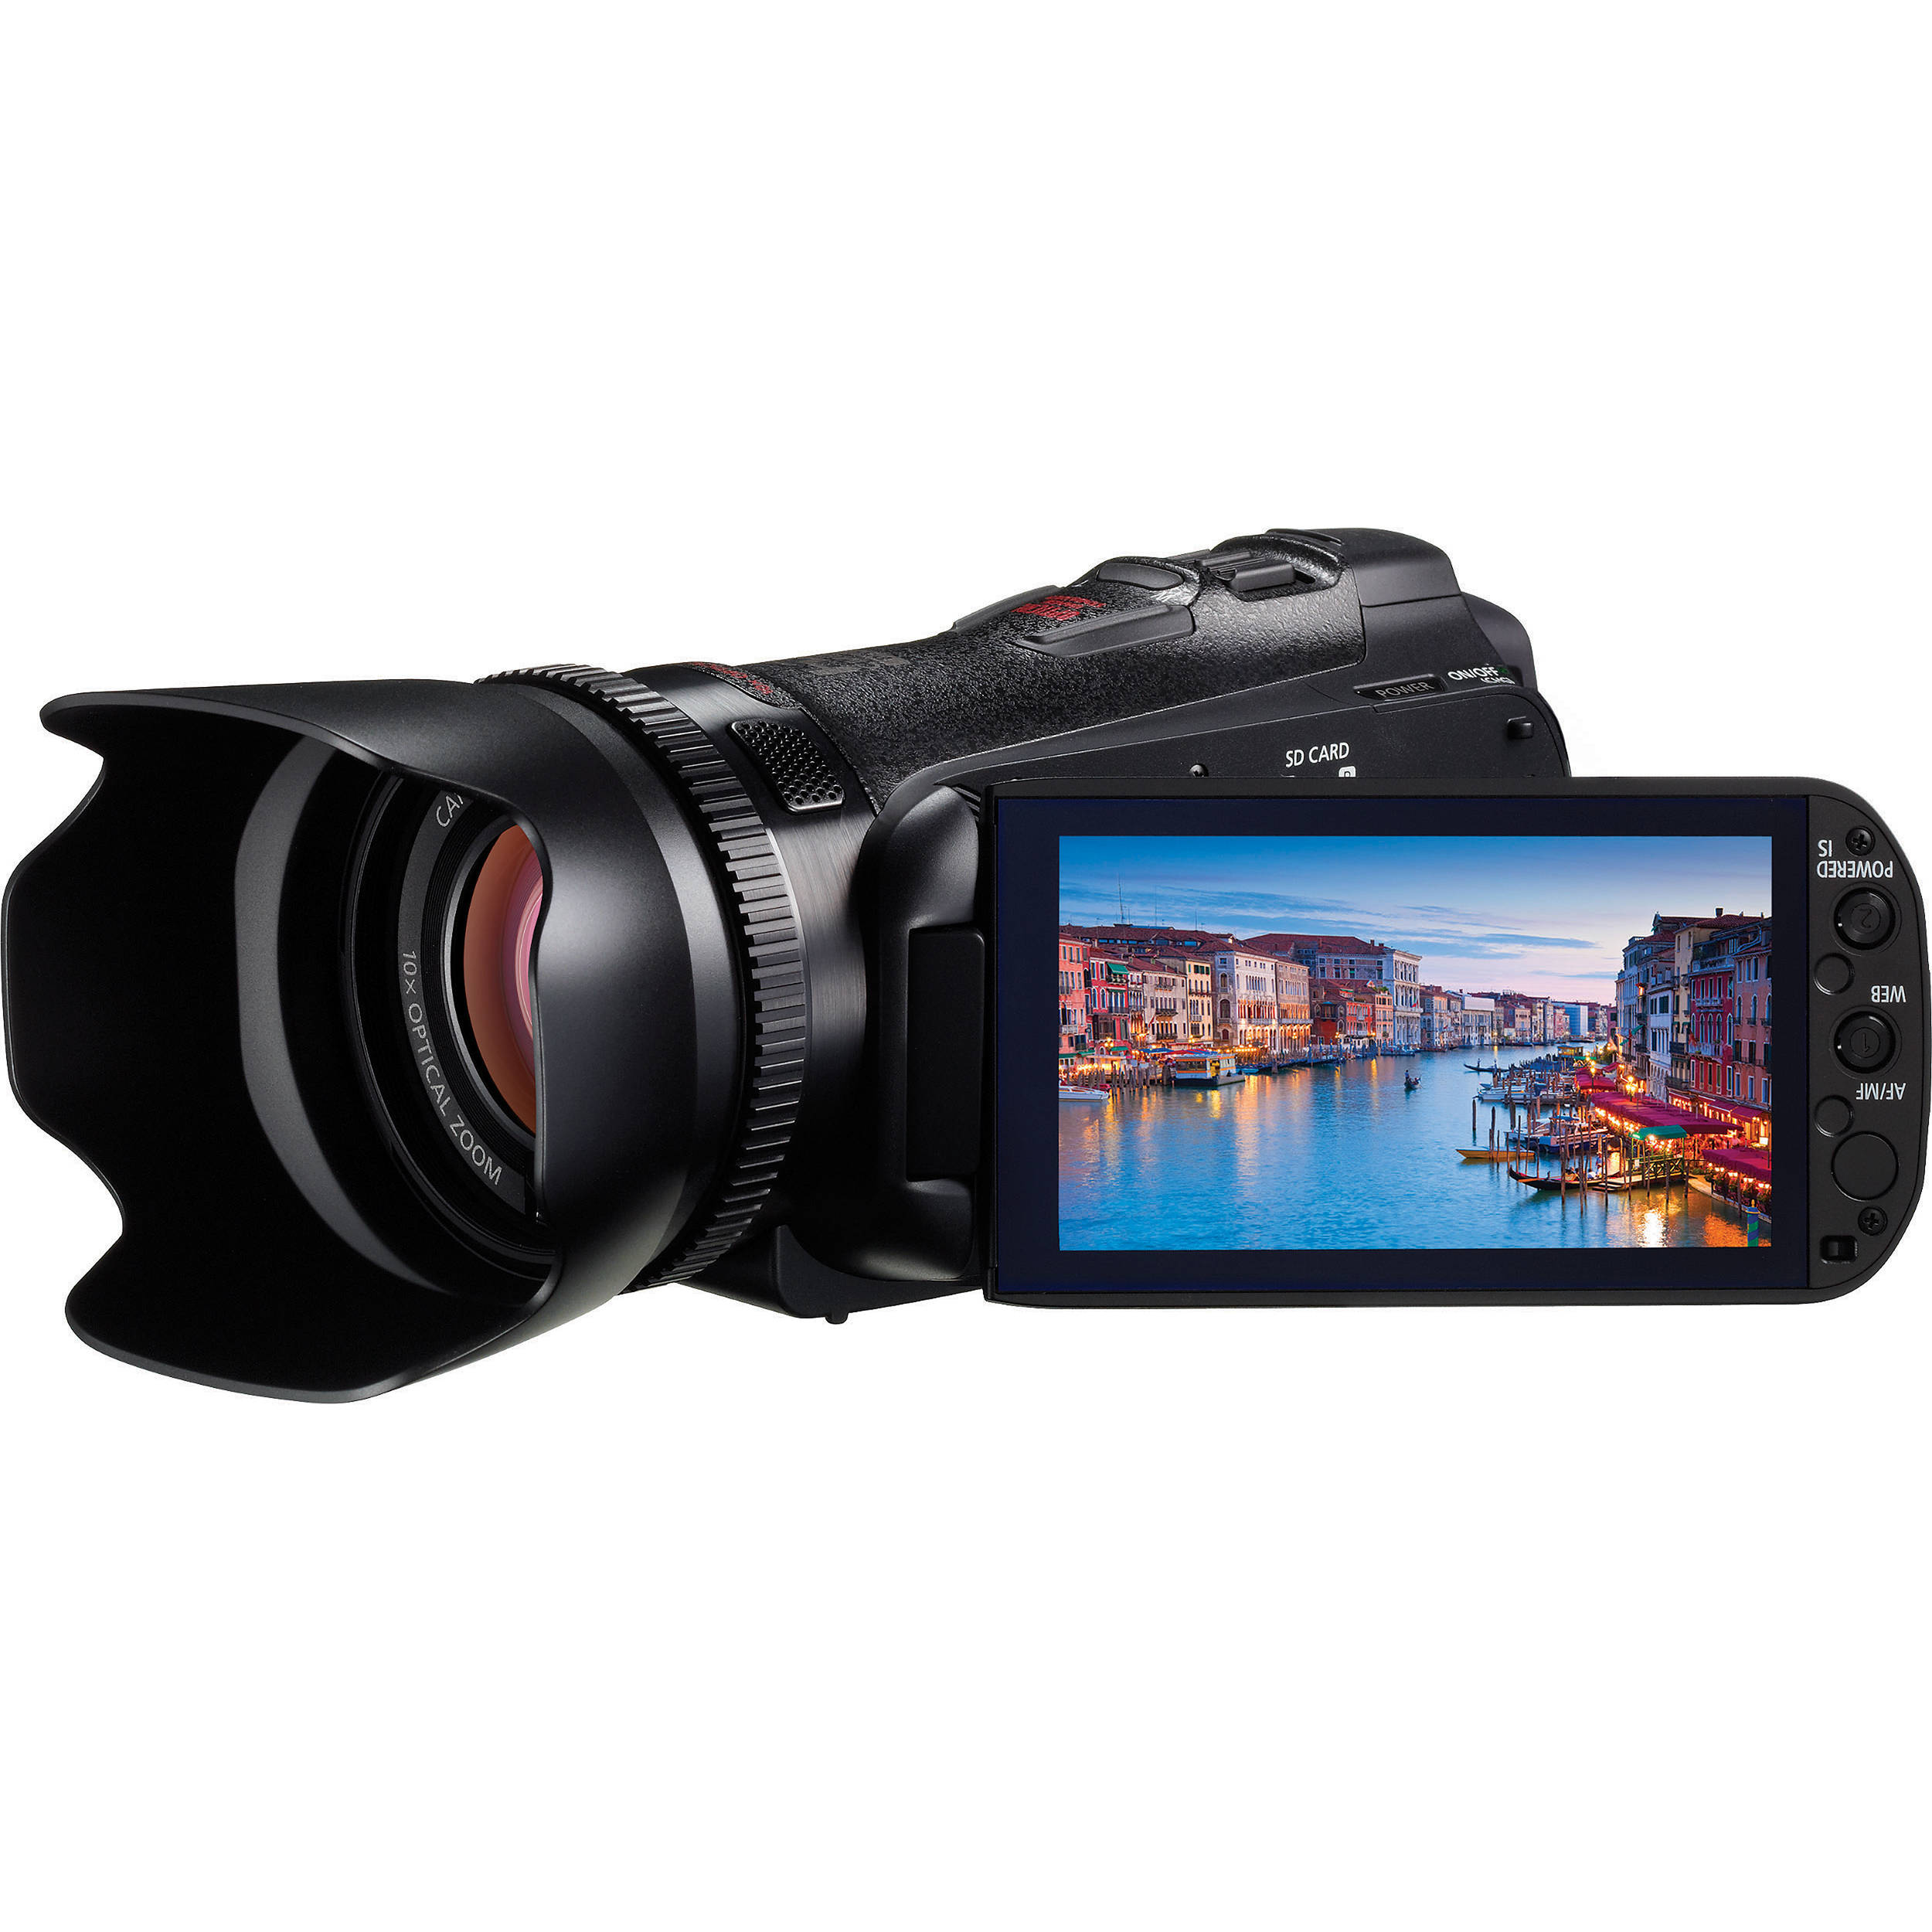 canon legria hf g10 flash memory pal camcorder hfg10e b h photo rh bhphotovideo com Canon Professional Cameras Canon HF G30